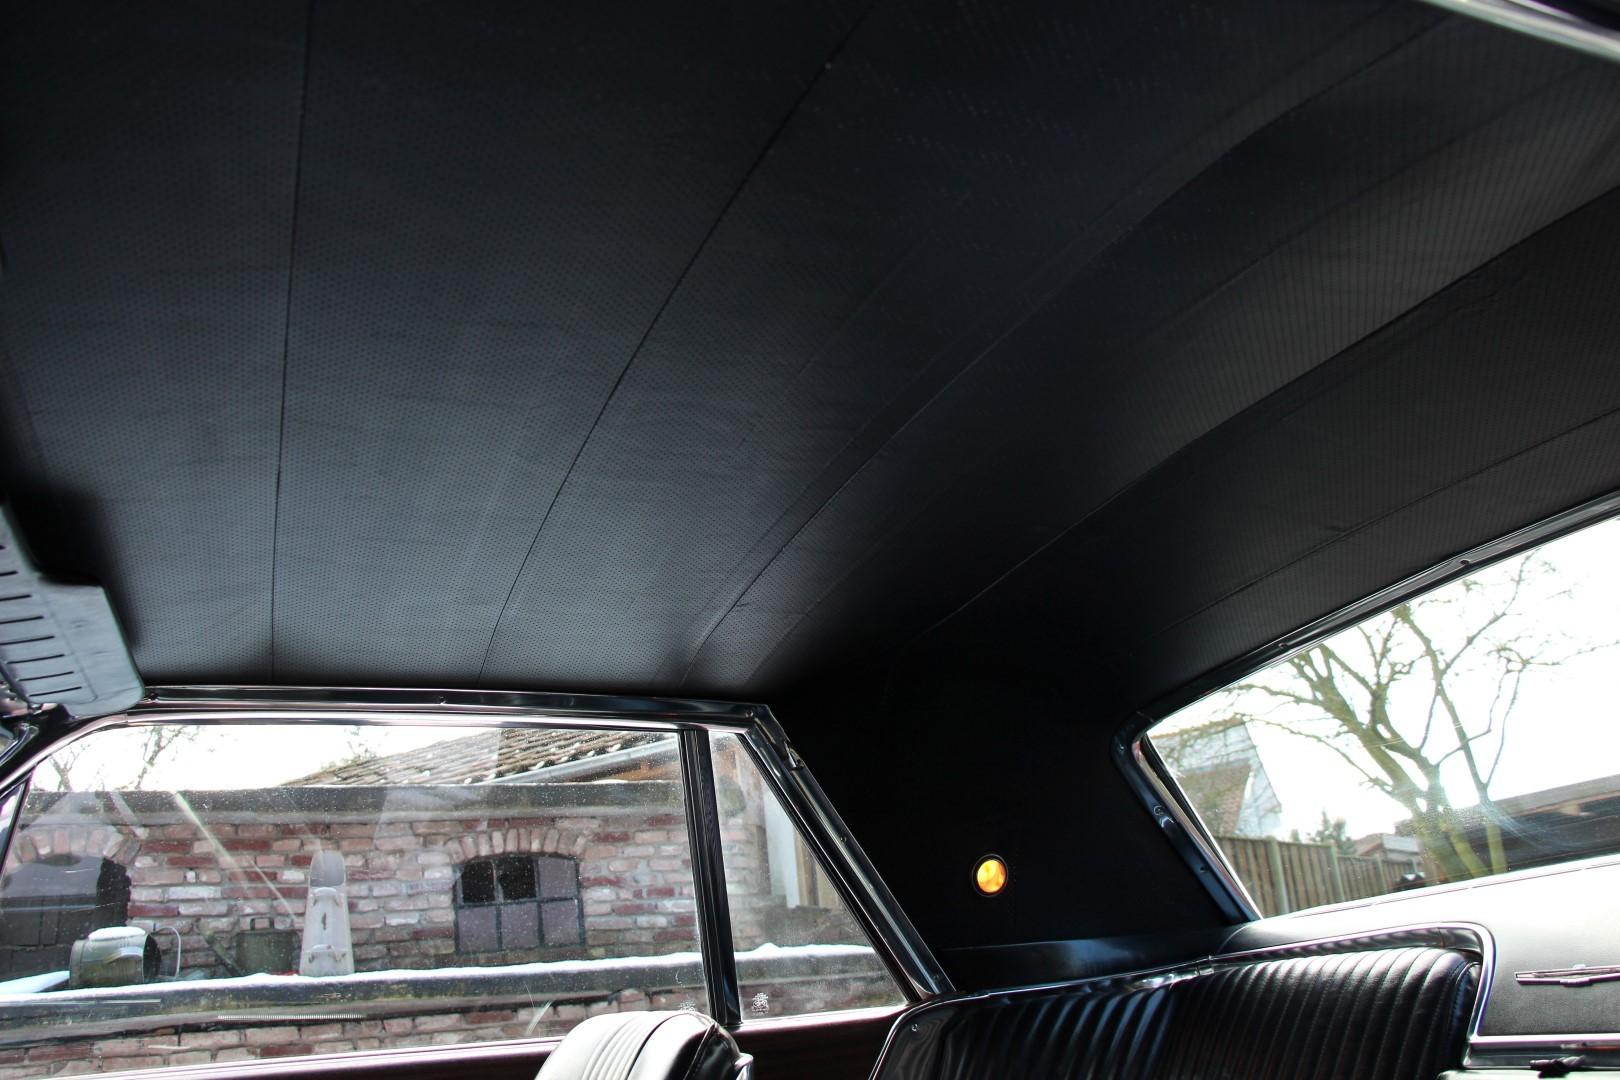 1965 Ford Thunderbird Hardtop - Burgundy new (10)